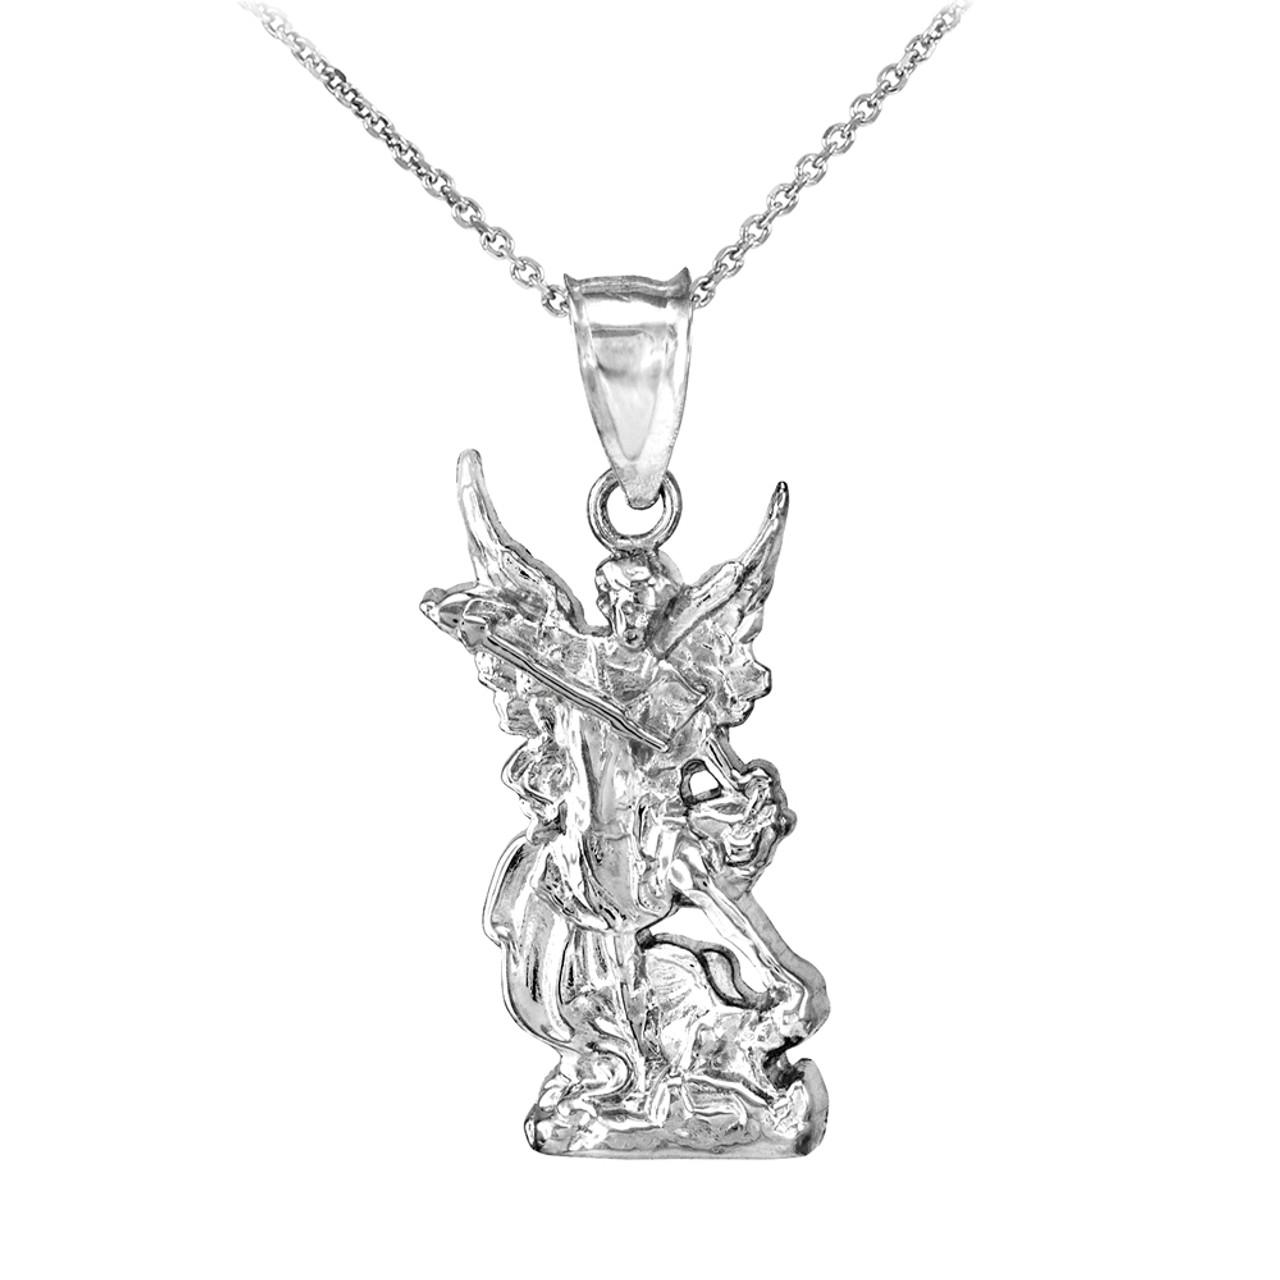 8df969baf 925 Sterling Silver St. Michael Pendant Necklace